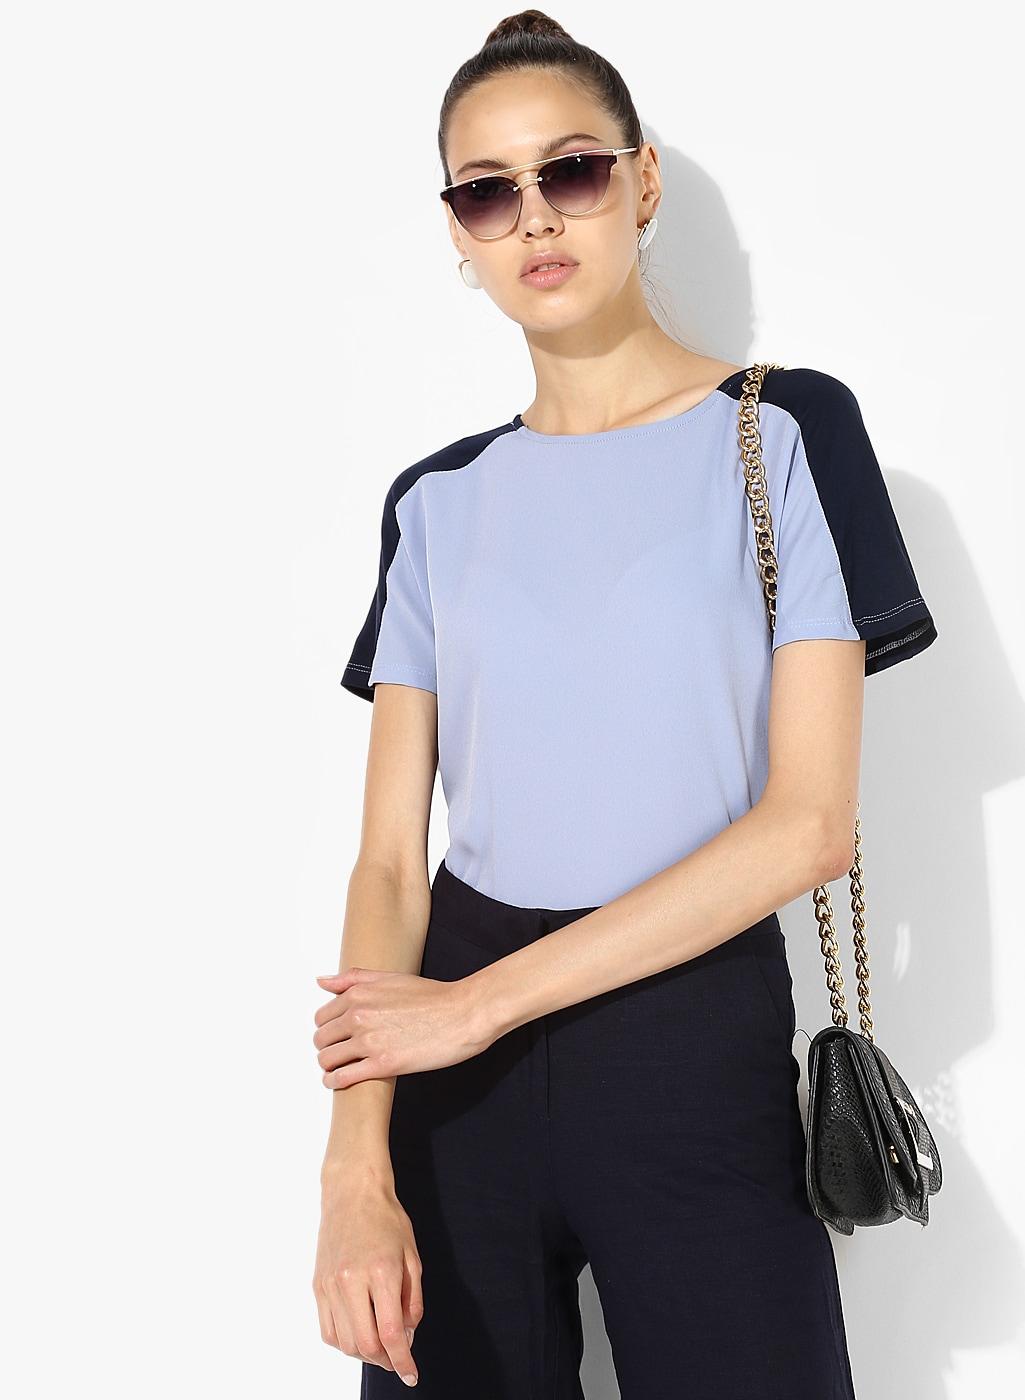 08aa965cc73 Ladies Tops - Buy Tops   T-shirts for Women Online